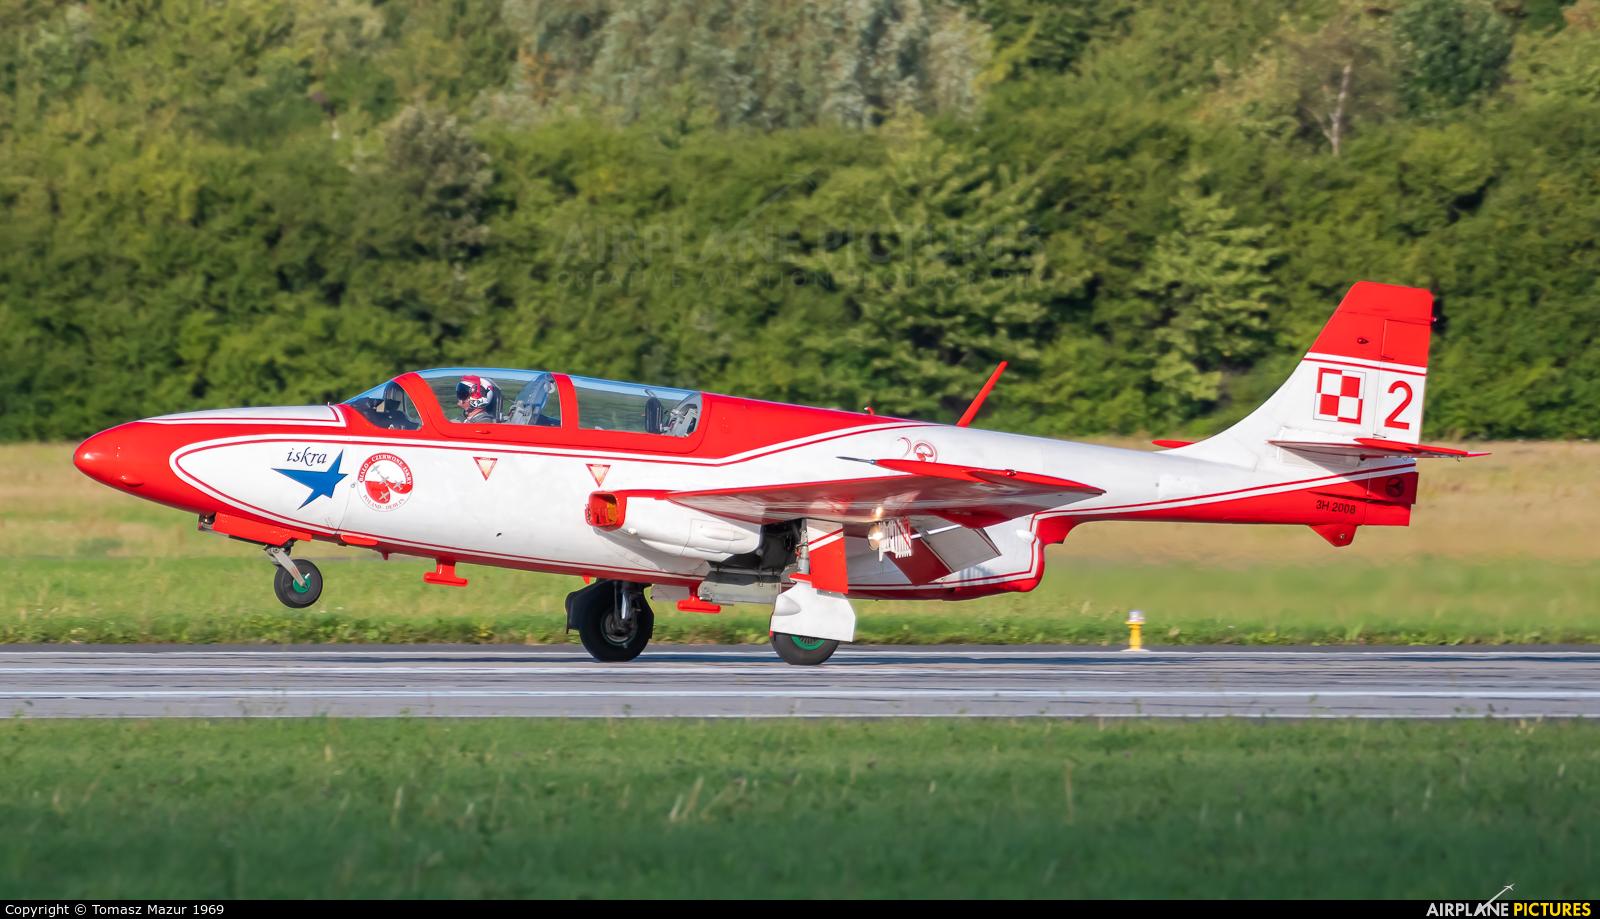 Poland - Air Force: White & Red Iskras 2 aircraft at Gdynia- Babie Doły (Oksywie)